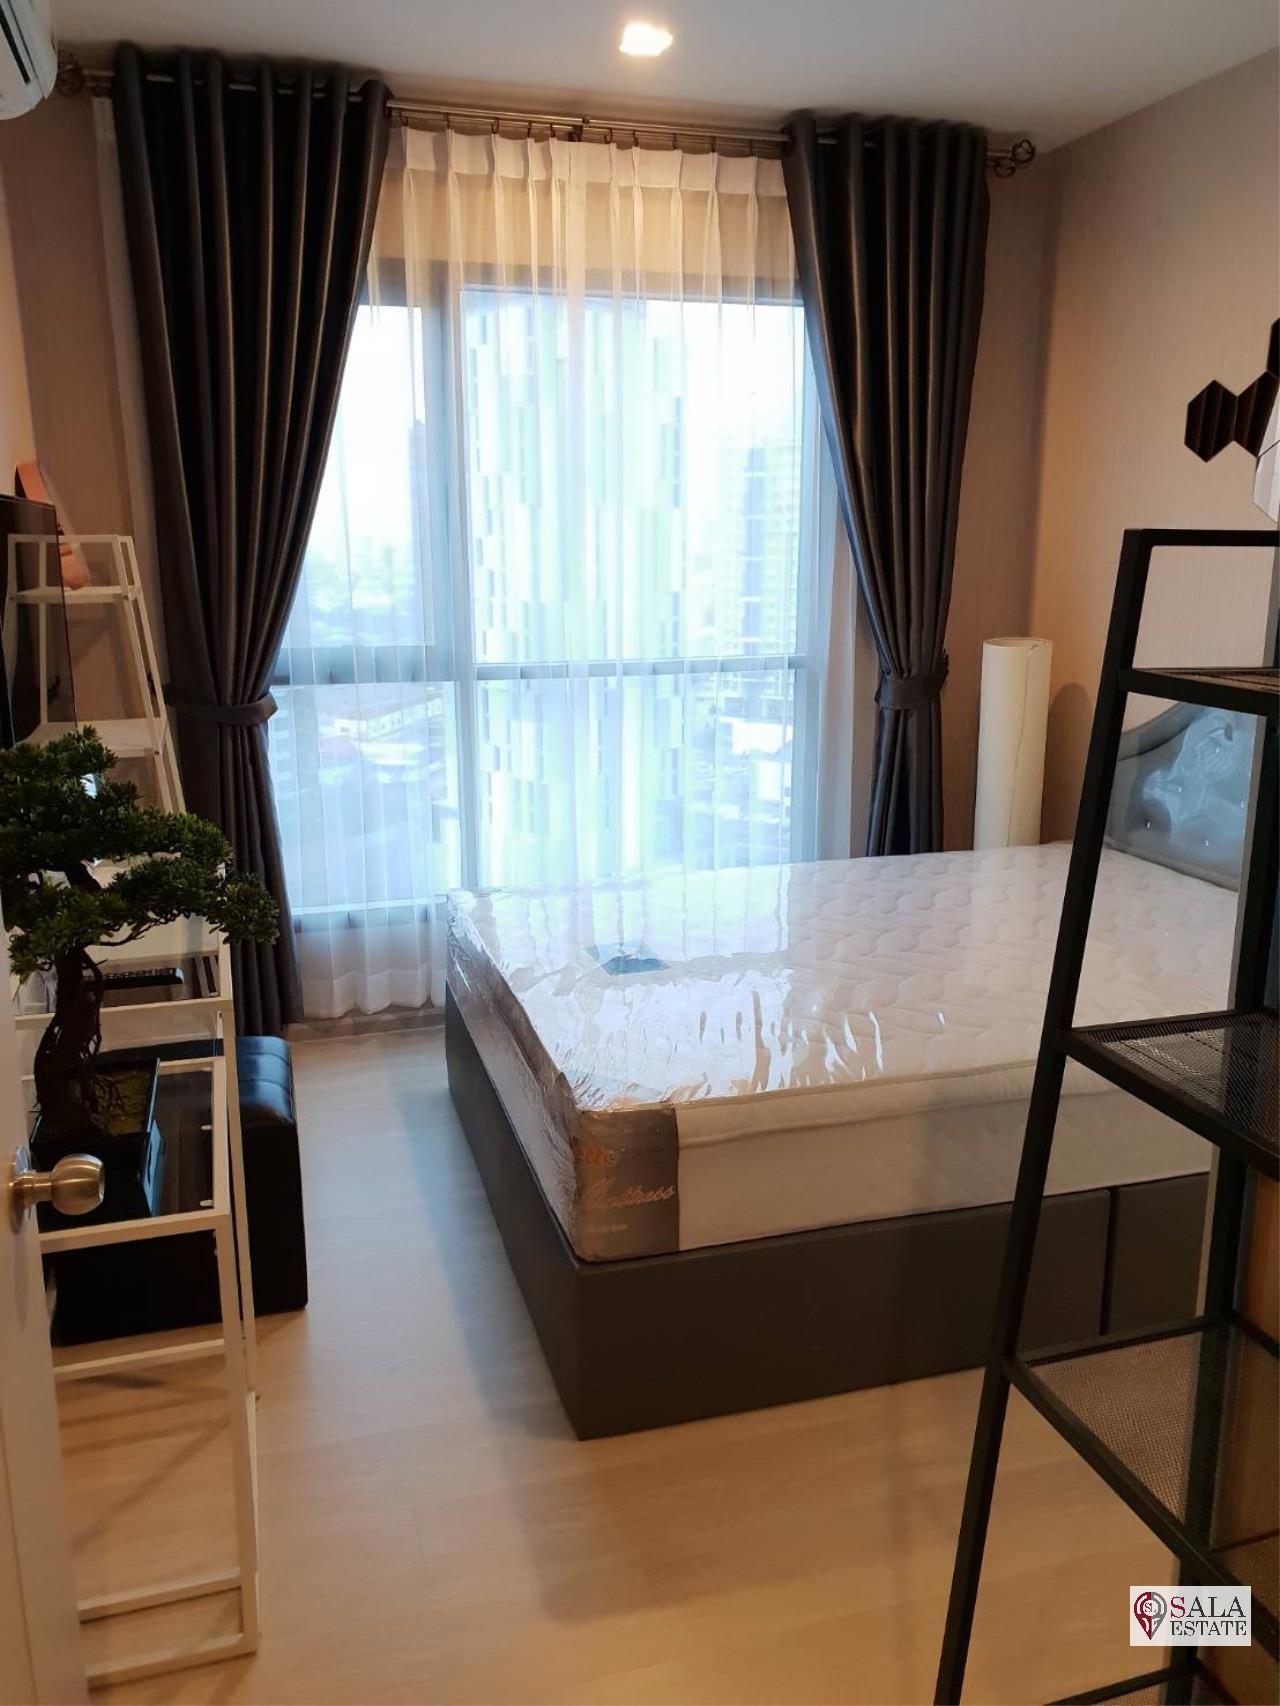 SALA ESTATE Agency's ( SELL WITH TENANT ) LIFE SUKHUMVIT 48 – BTS PHRA KHANONG, 1 BEDROOM  BATHROOM 5